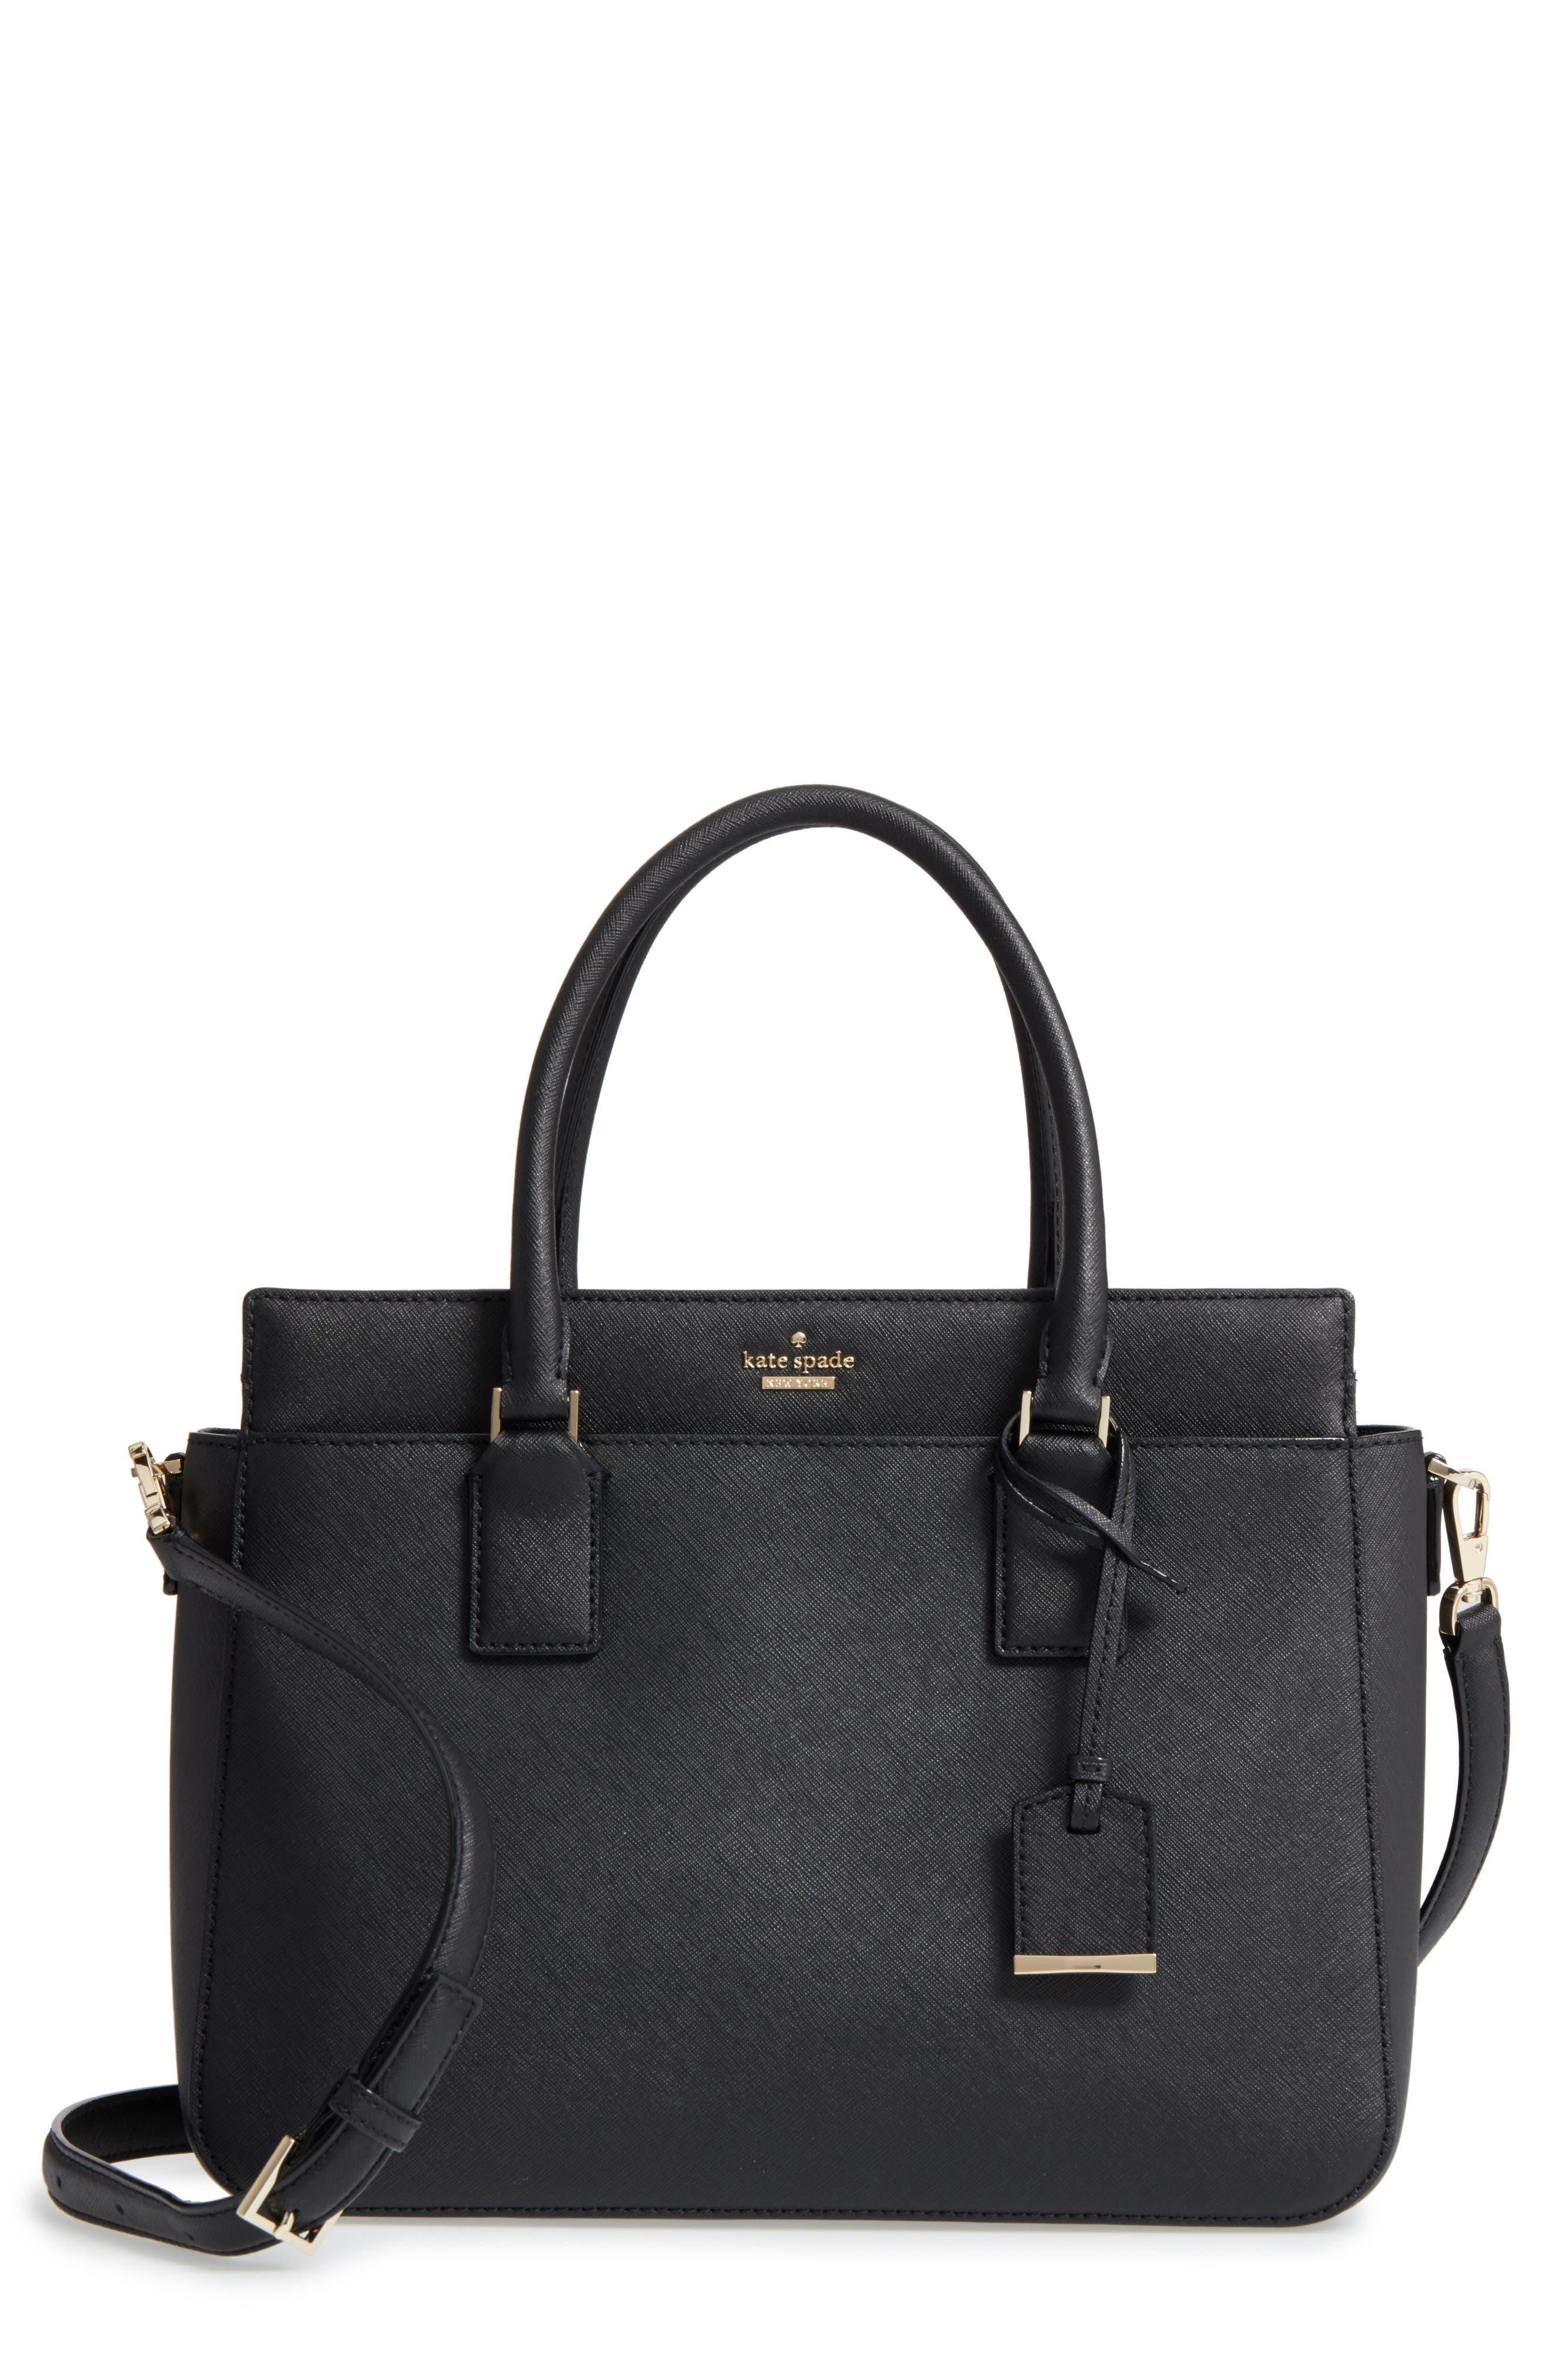 cameron street - sally leather satchel,                             Main thumbnail 1, color,                             001